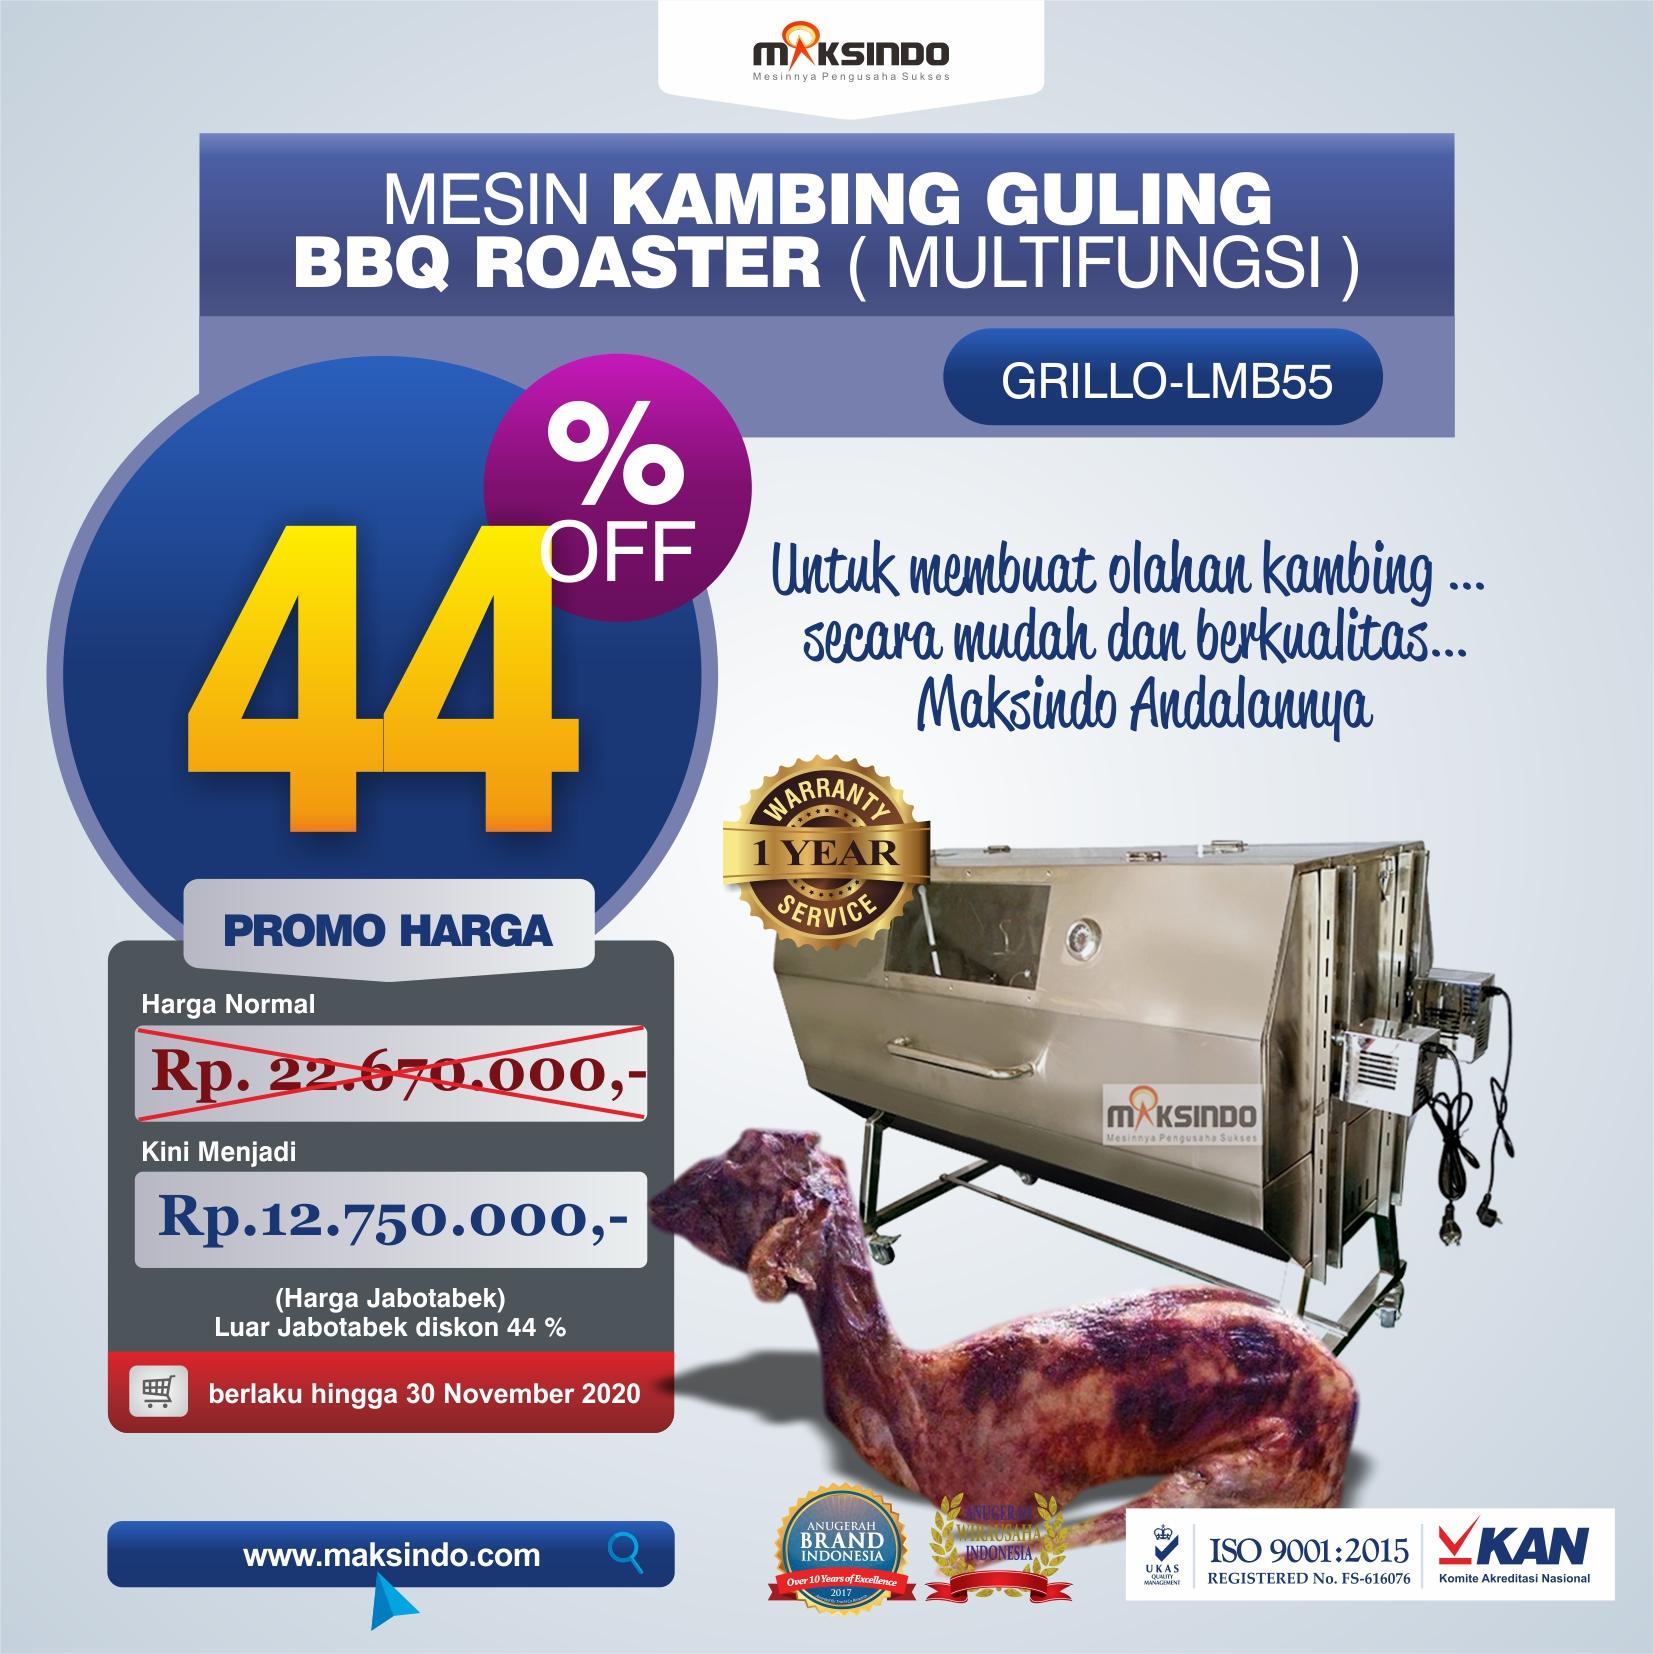 Jual Mesin Kambing Guling Double Location Roaster (GRILLO-LMB55) di Bekasi